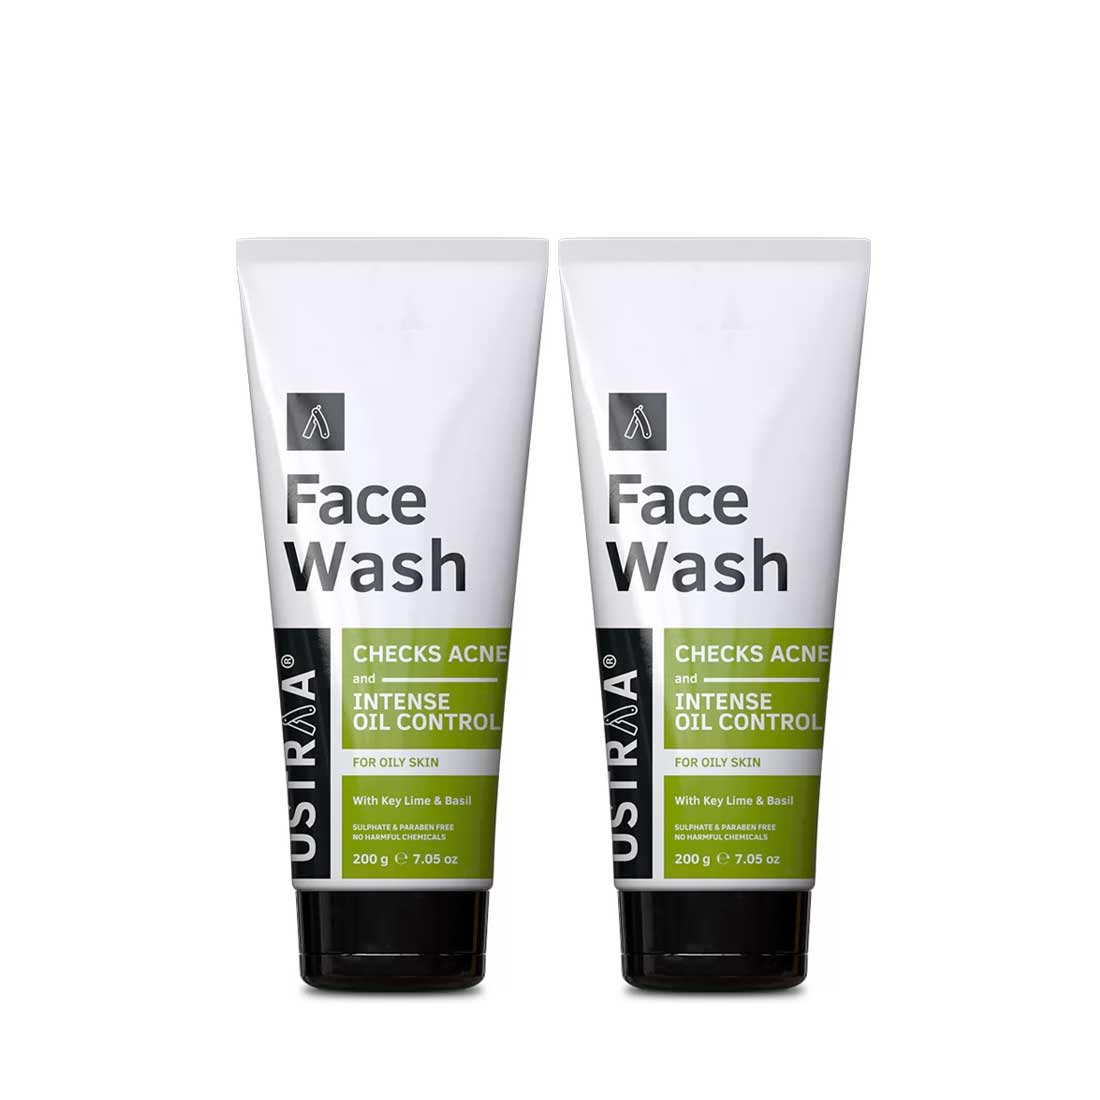 Face Wash - Oily Skin (Checks Acne & Oil Control) - Set of 2